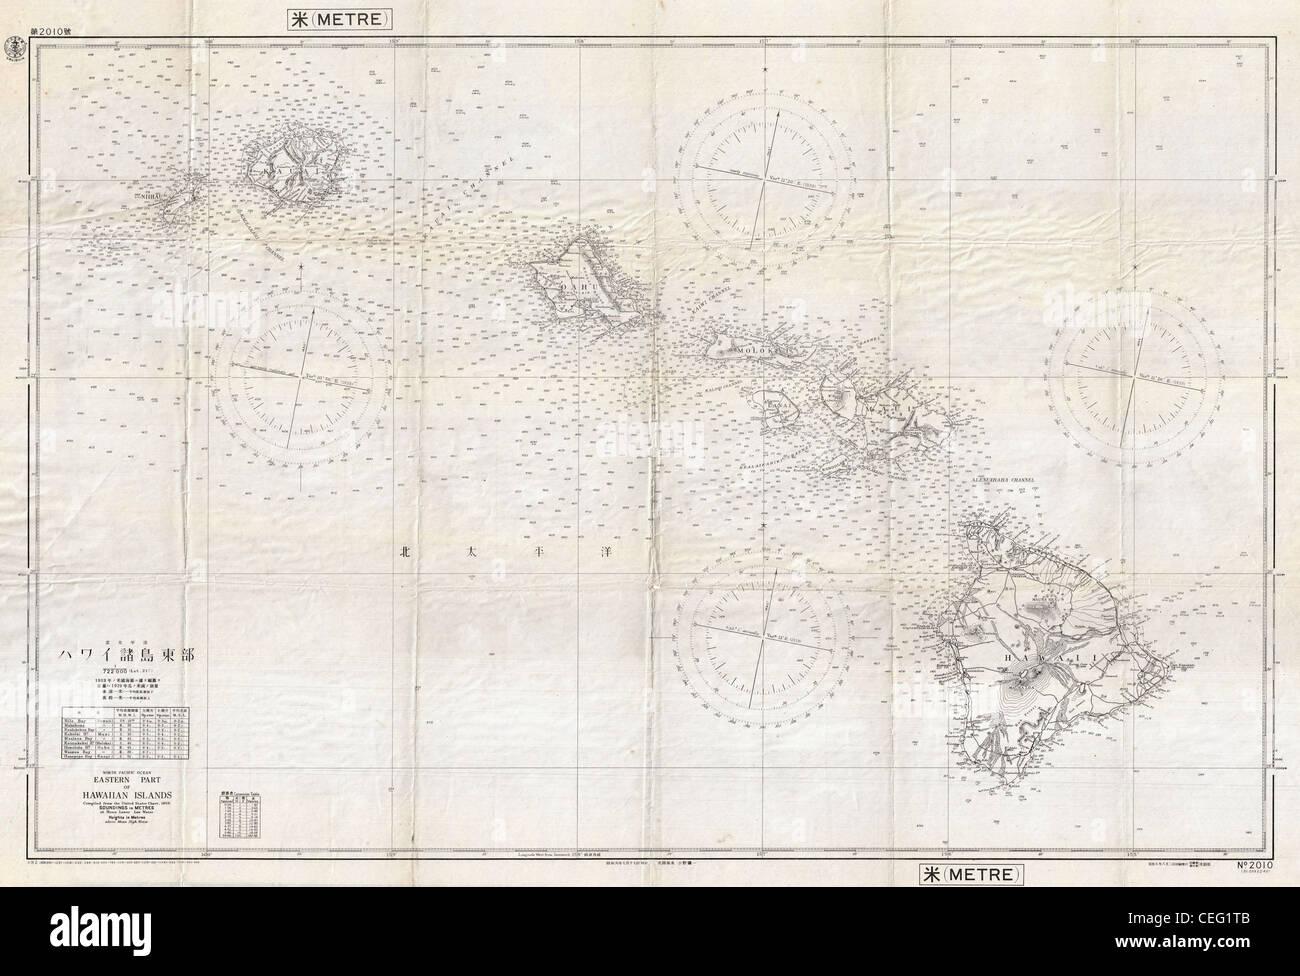 1939 japanese world war ii chart or map of hawaii stock photo 1939 japanese world war ii chart or map of hawaii gumiabroncs Choice Image